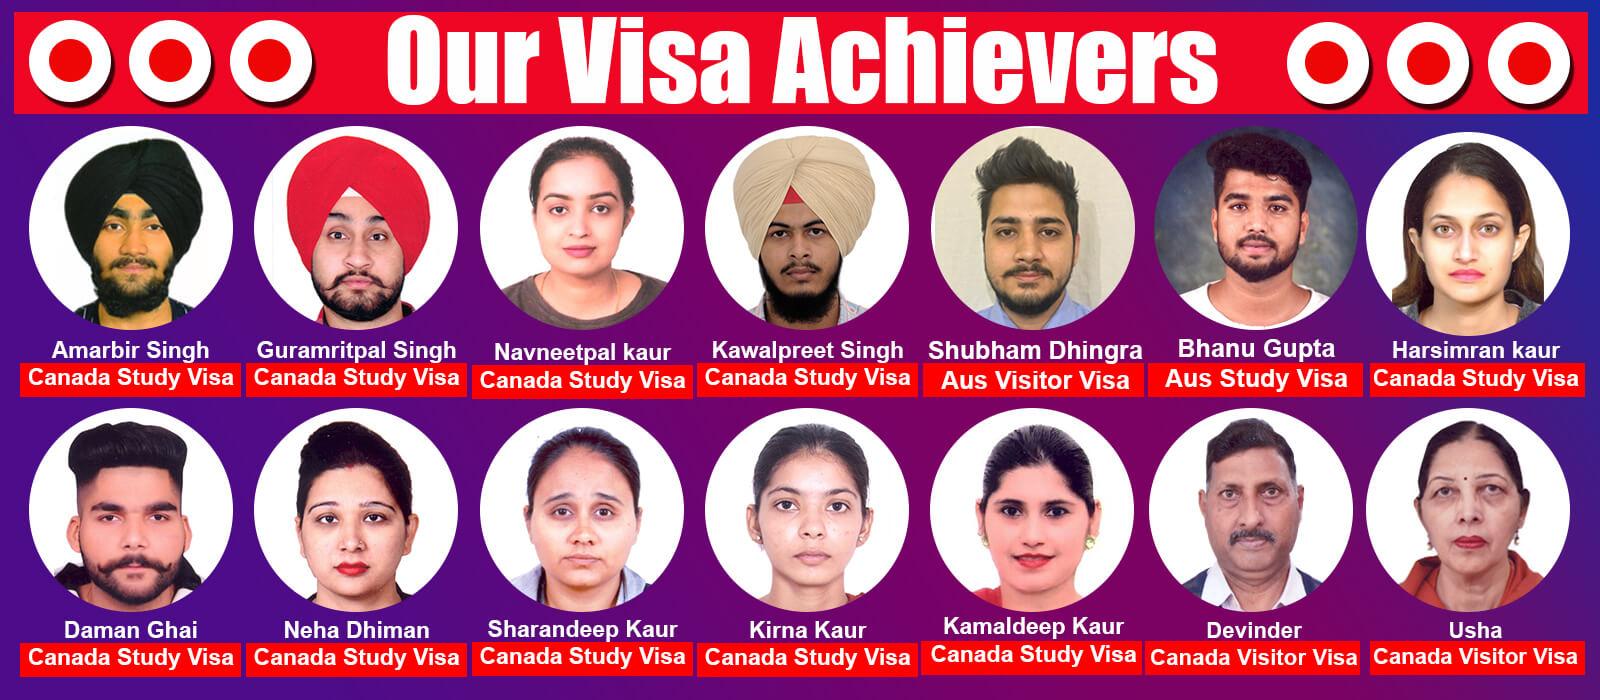 Visa Achievers